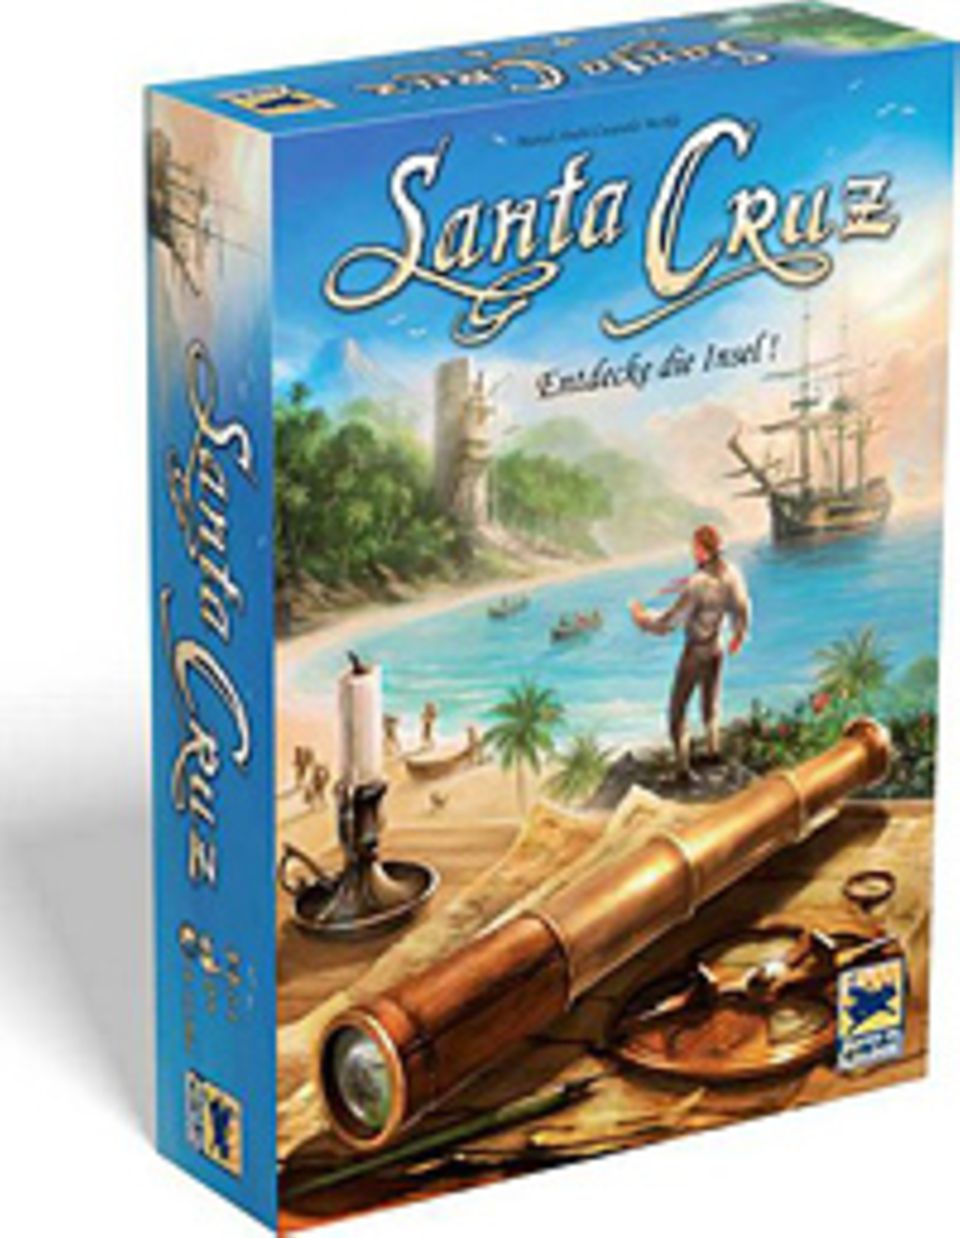 Spieletests: Spieltipp: Santa Cruz